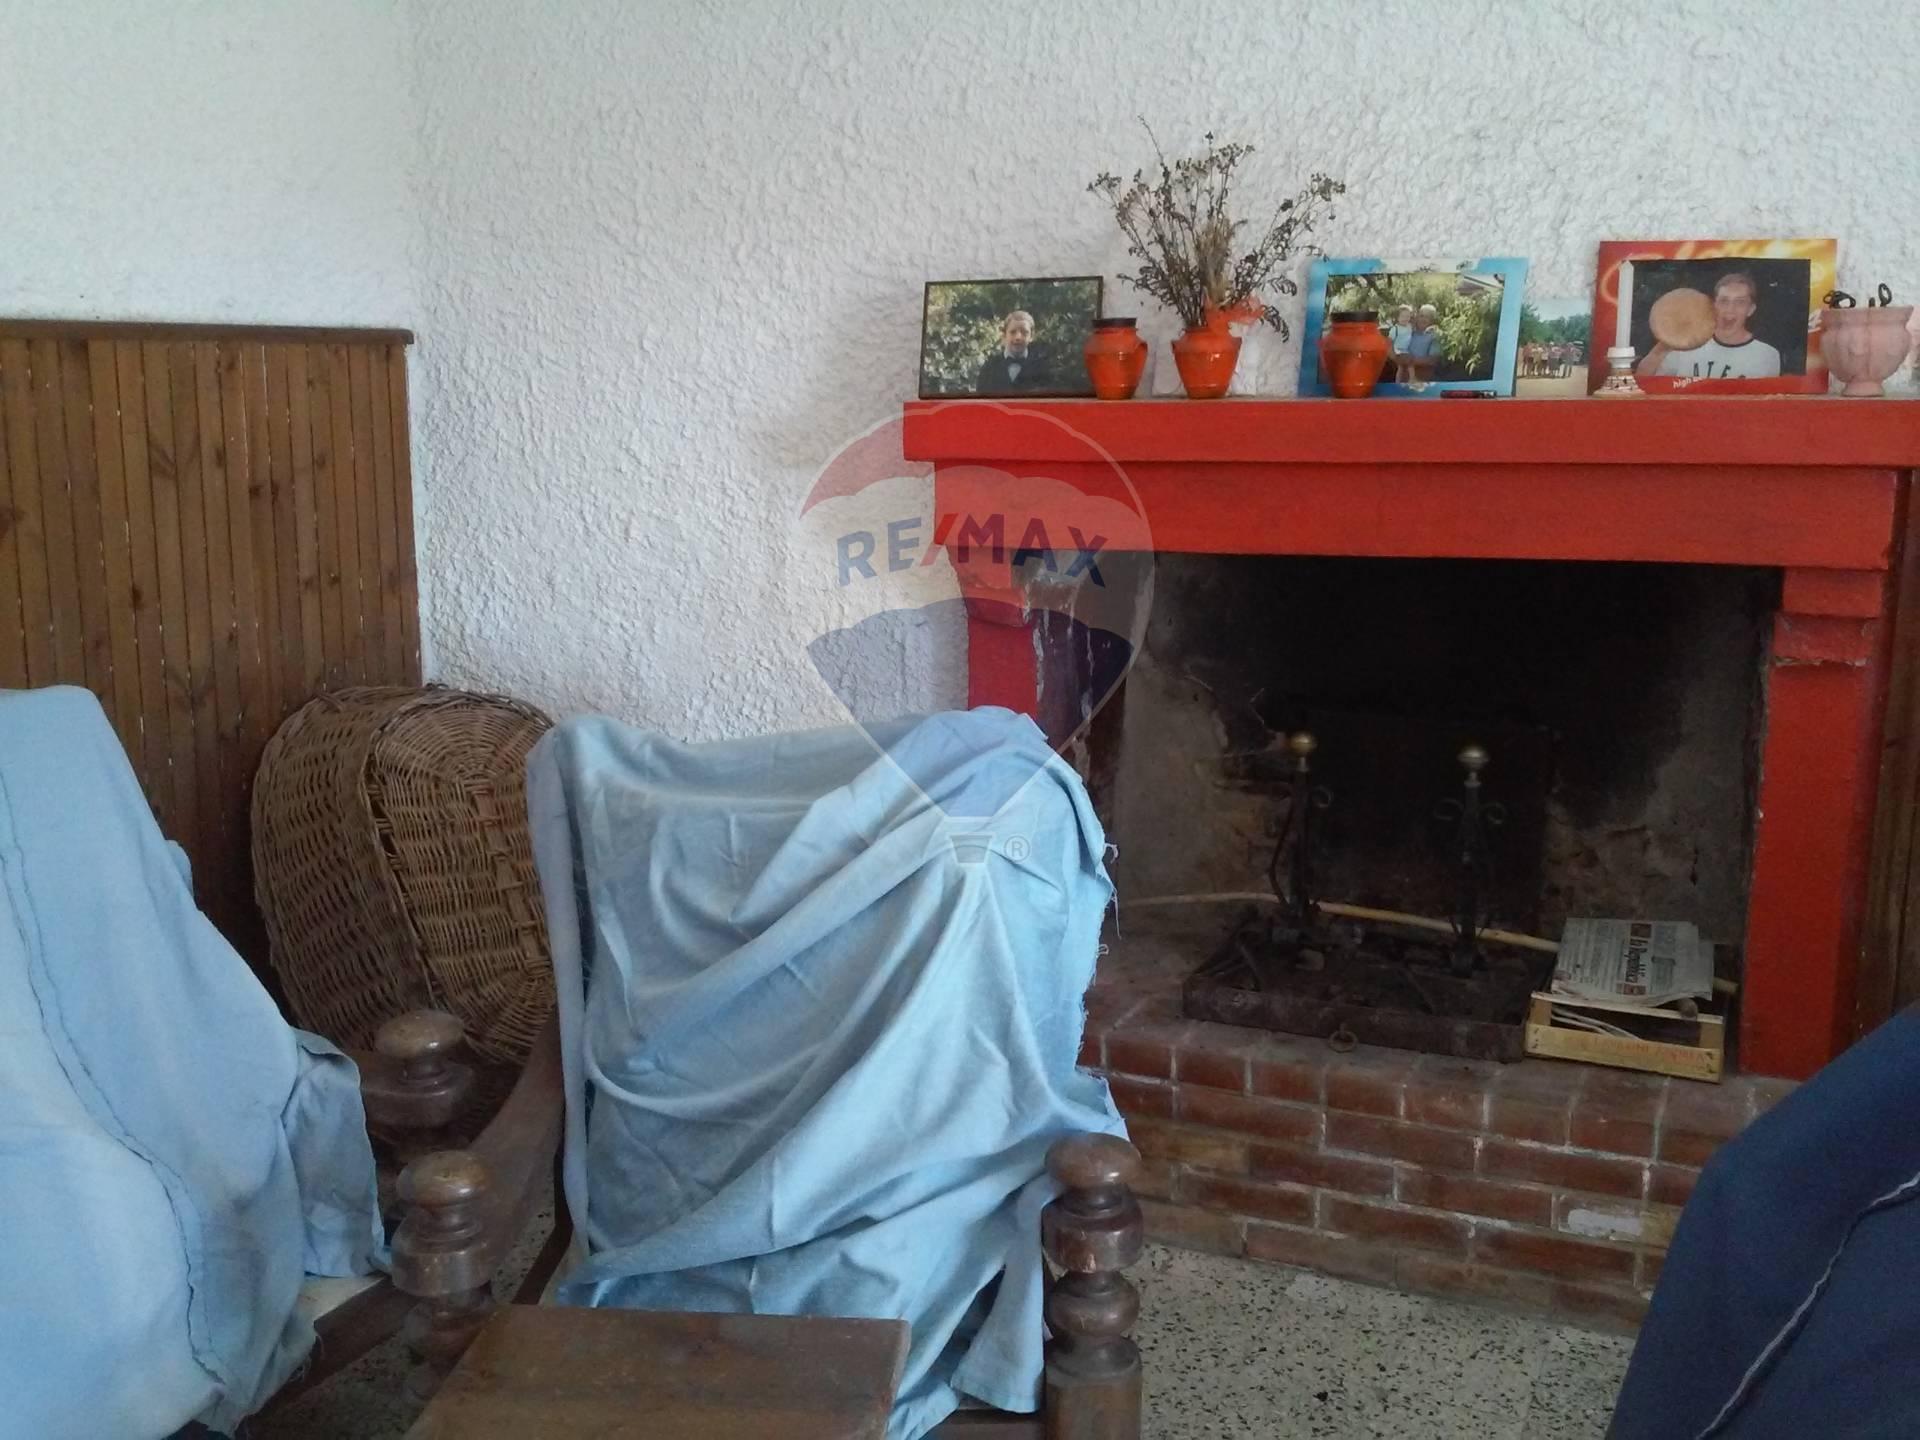 CASA SEMI INDIPENDENTE in VENDITA a CASTIGLIONE DI GARFAGNANA